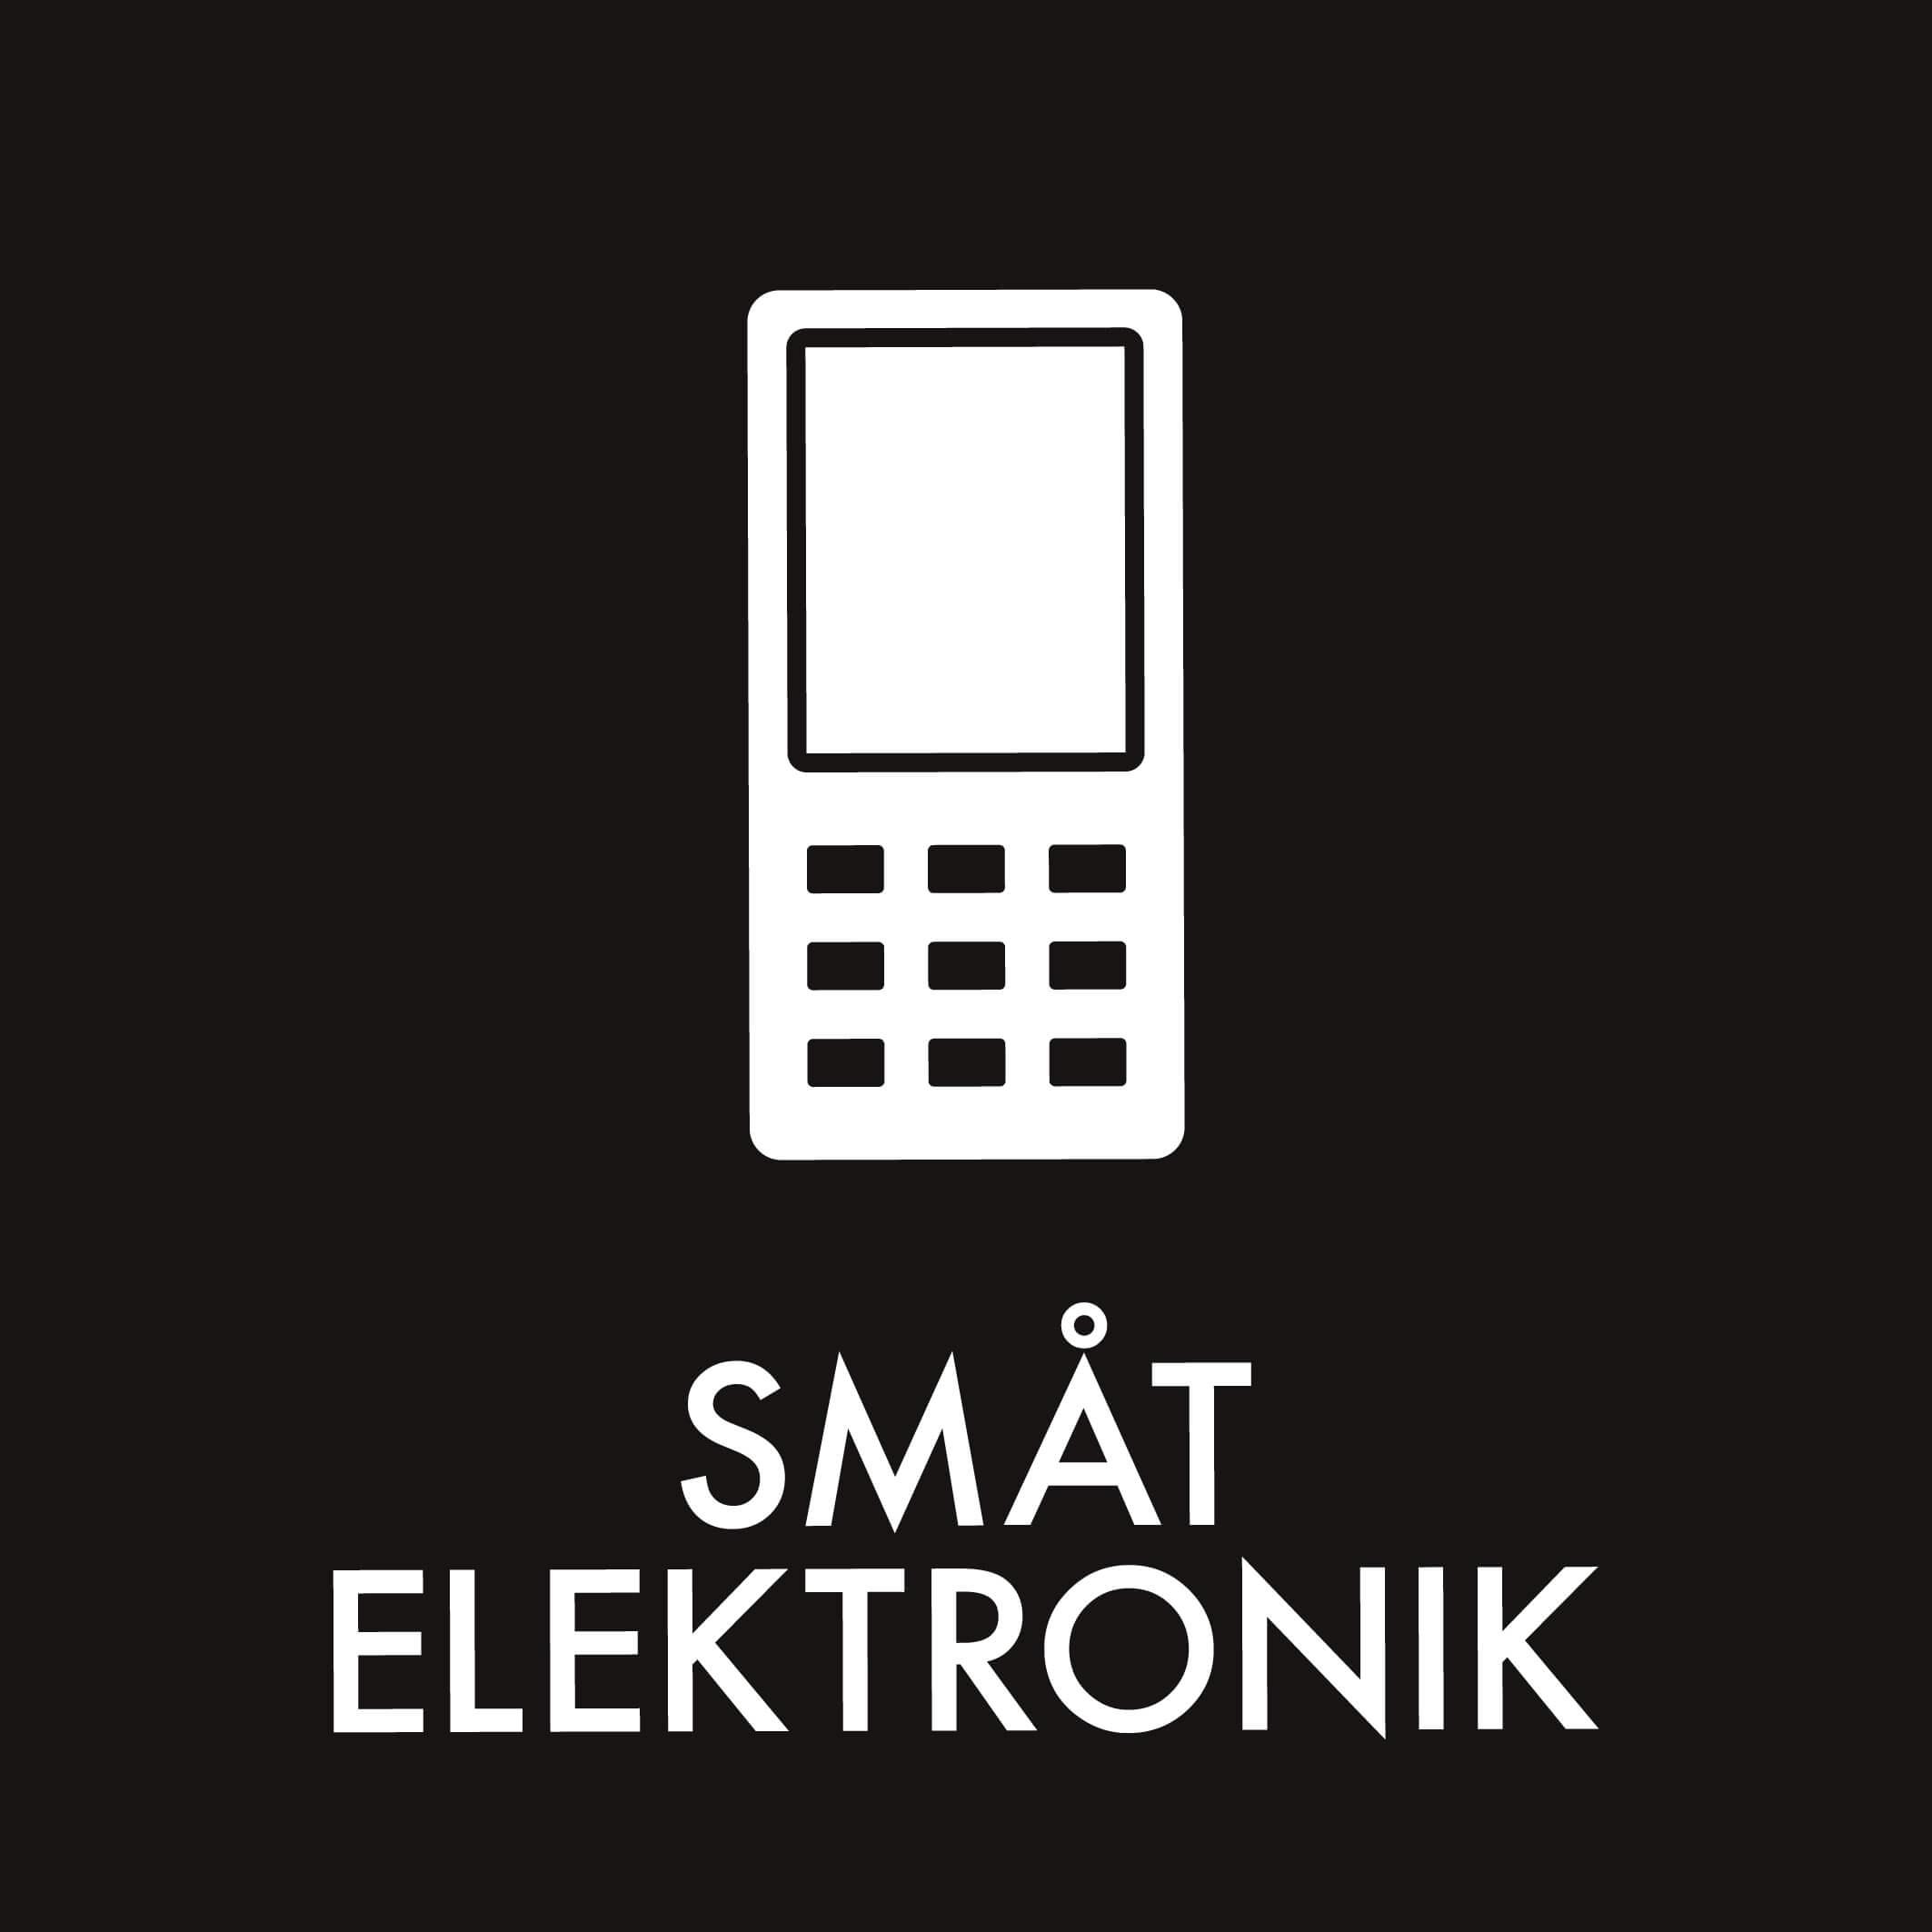 Dansk Affaldssortering - Småt elektronik sort